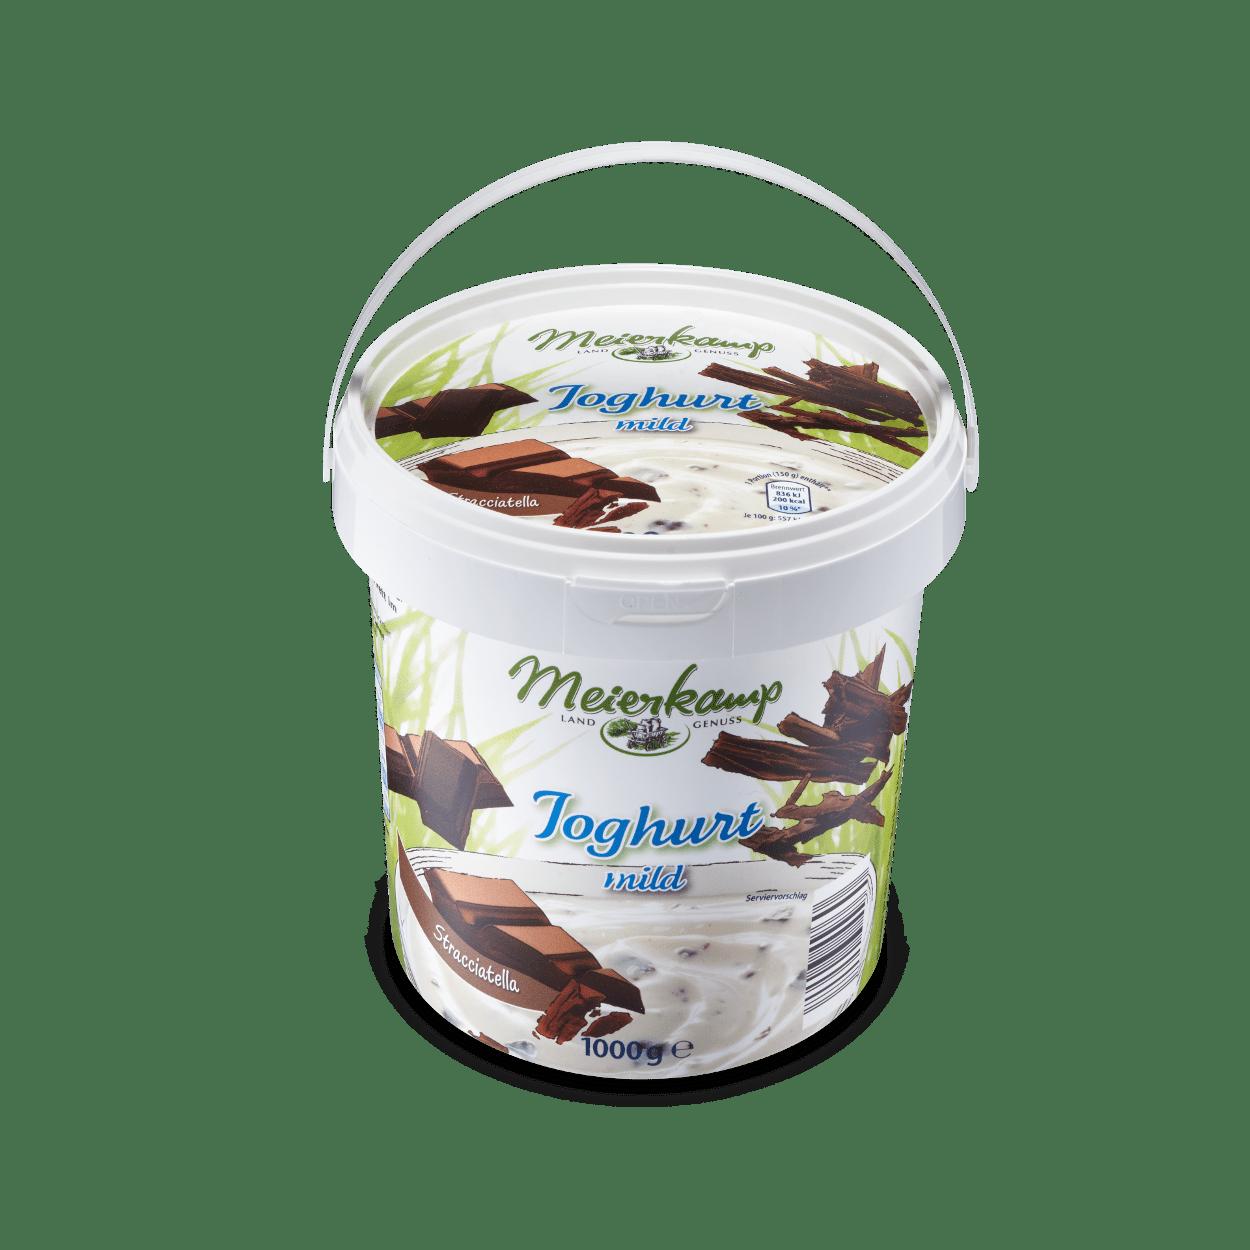 Joghurt Pudding Dessert Gunstig Bei Aldi Nord